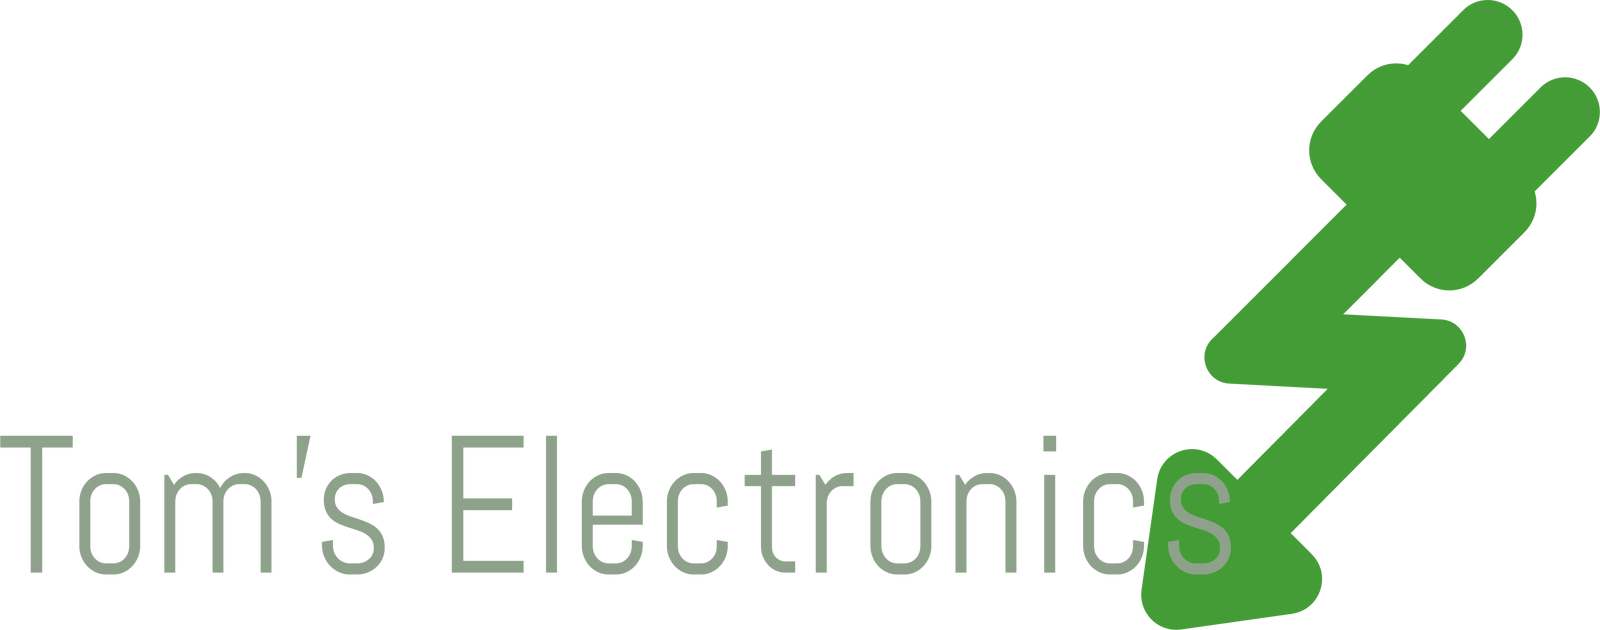 Toms Electronics Repairs